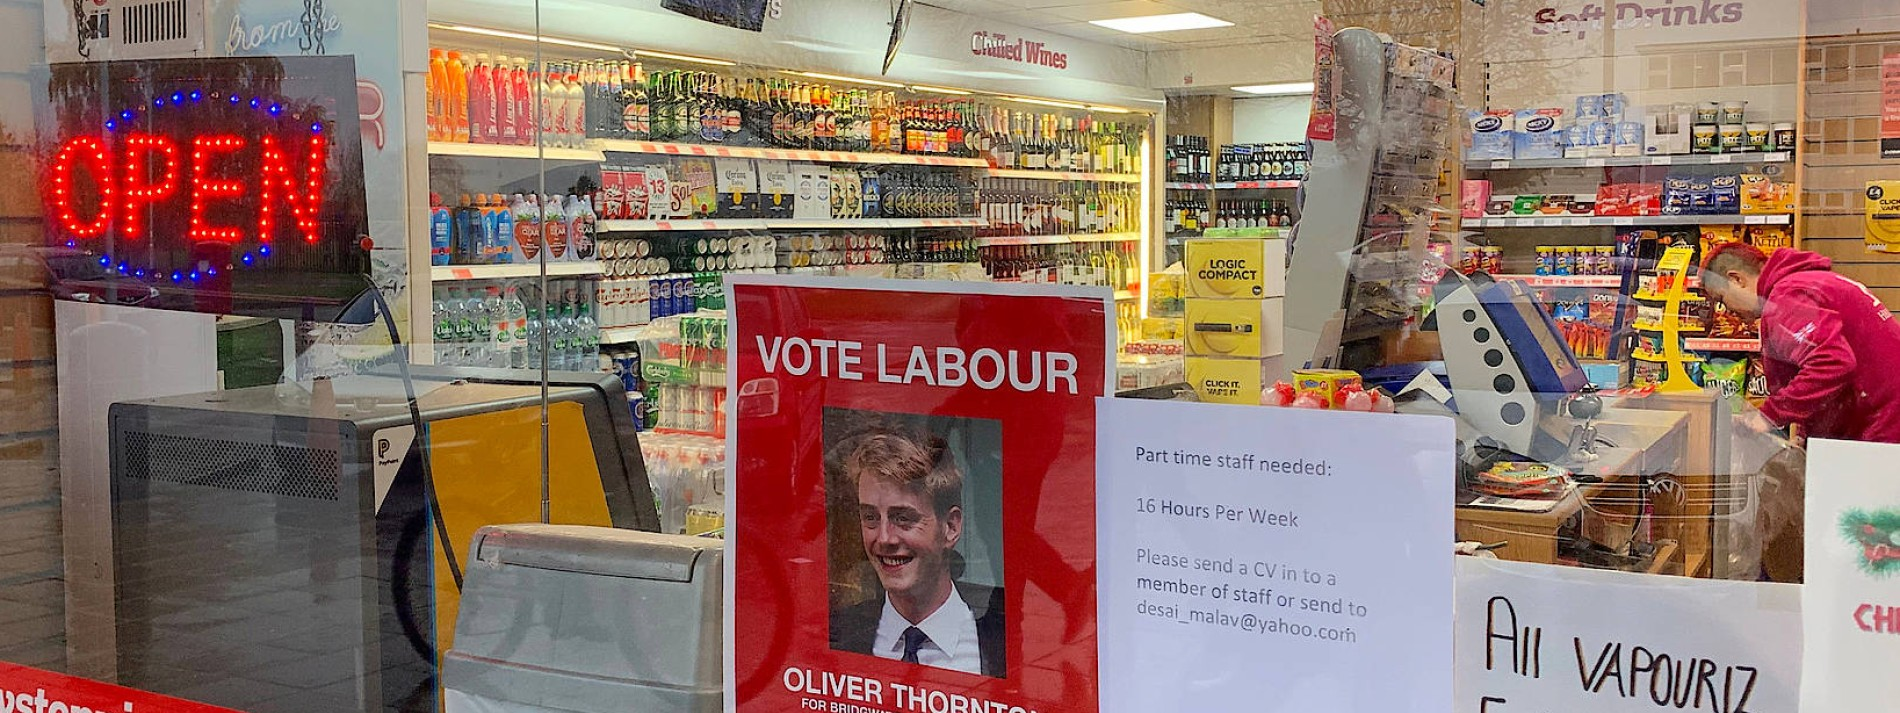 Stimmen gewinnen trotz Corbyn